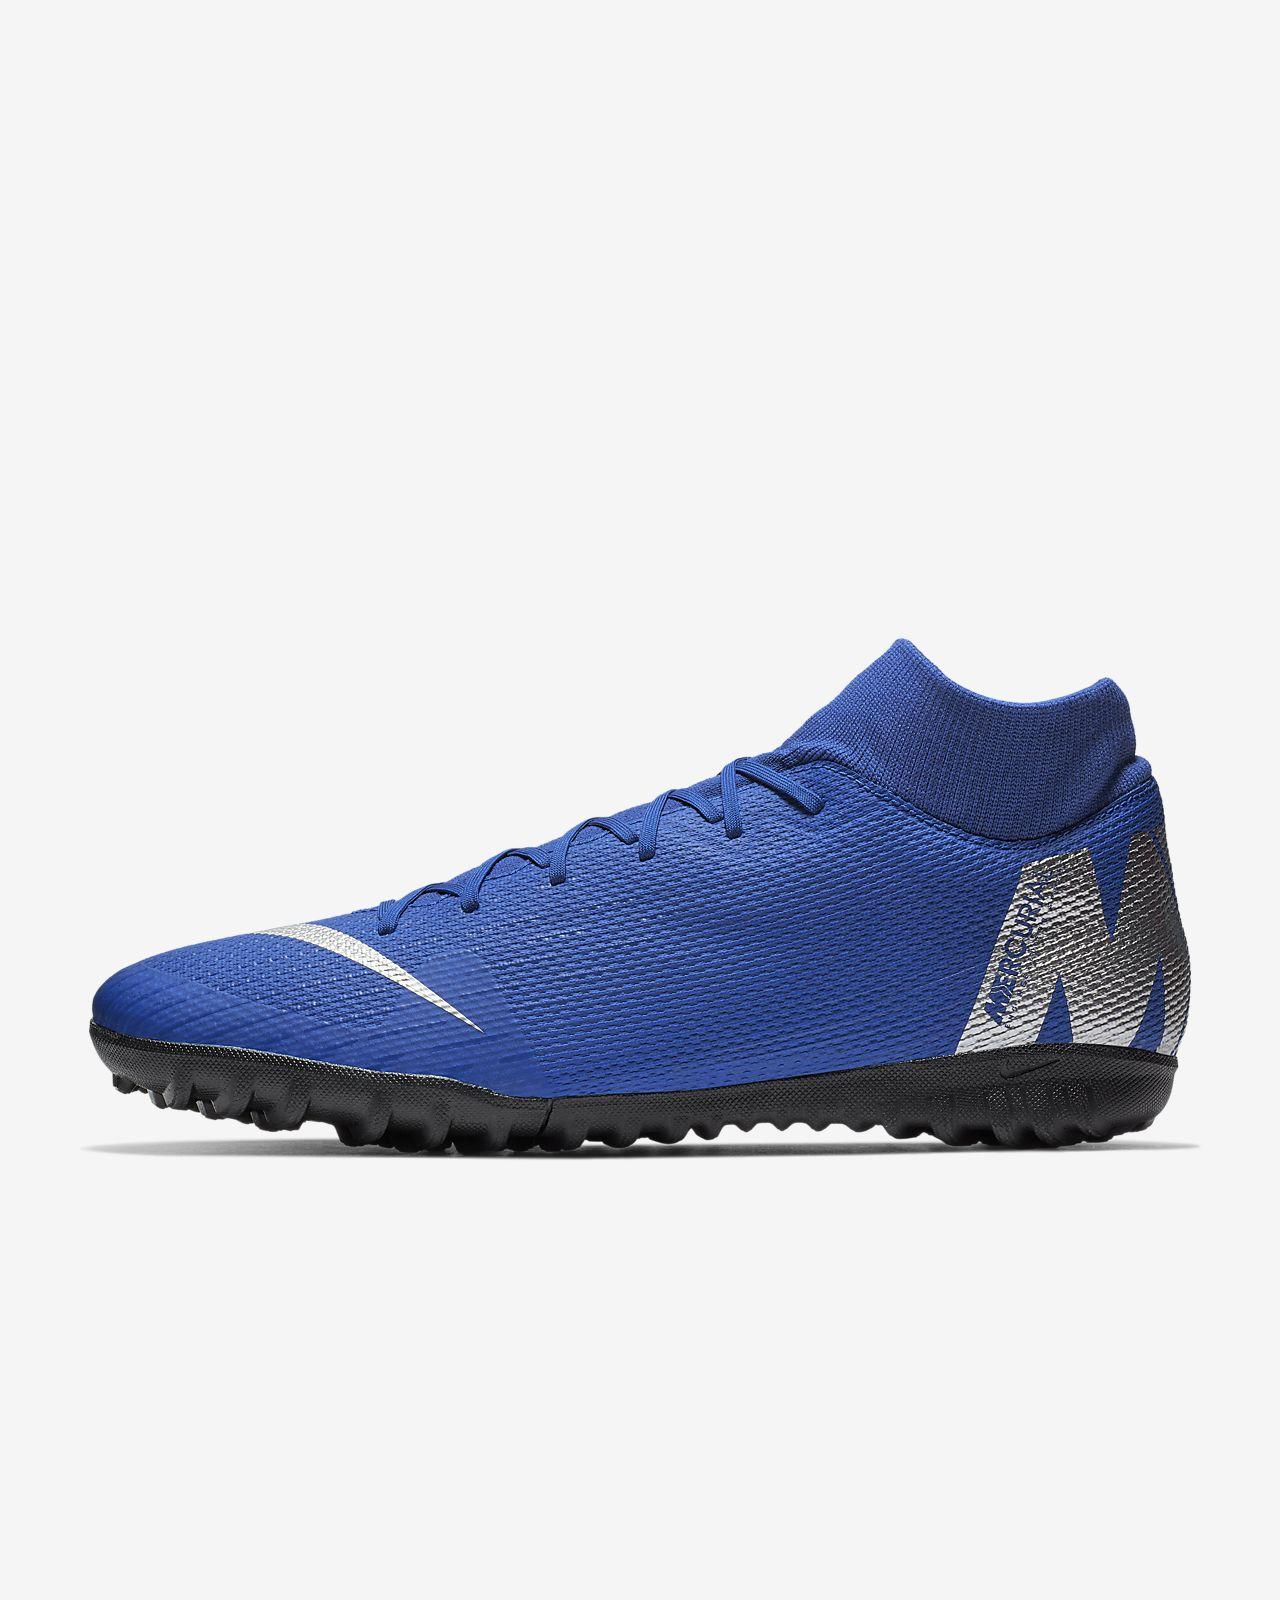 Nike MercurialX Superfly VI Academy Artificial-Turf Football Shoe